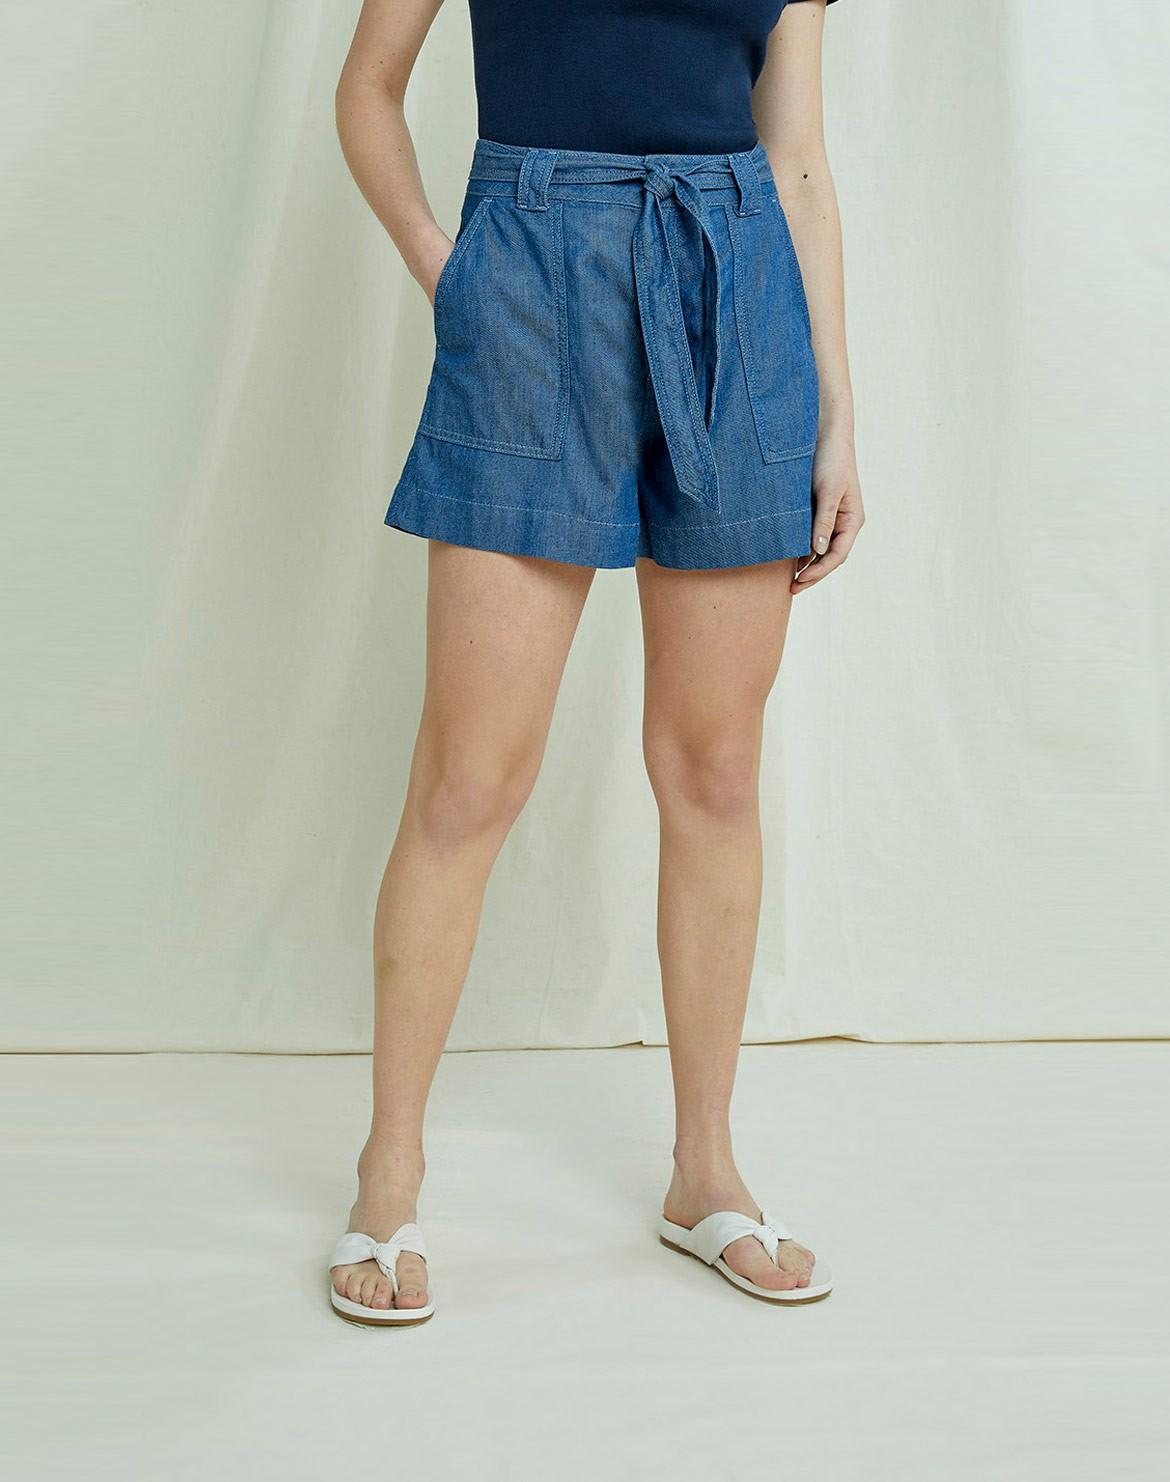 Zahara Lightweight Denim Shorts